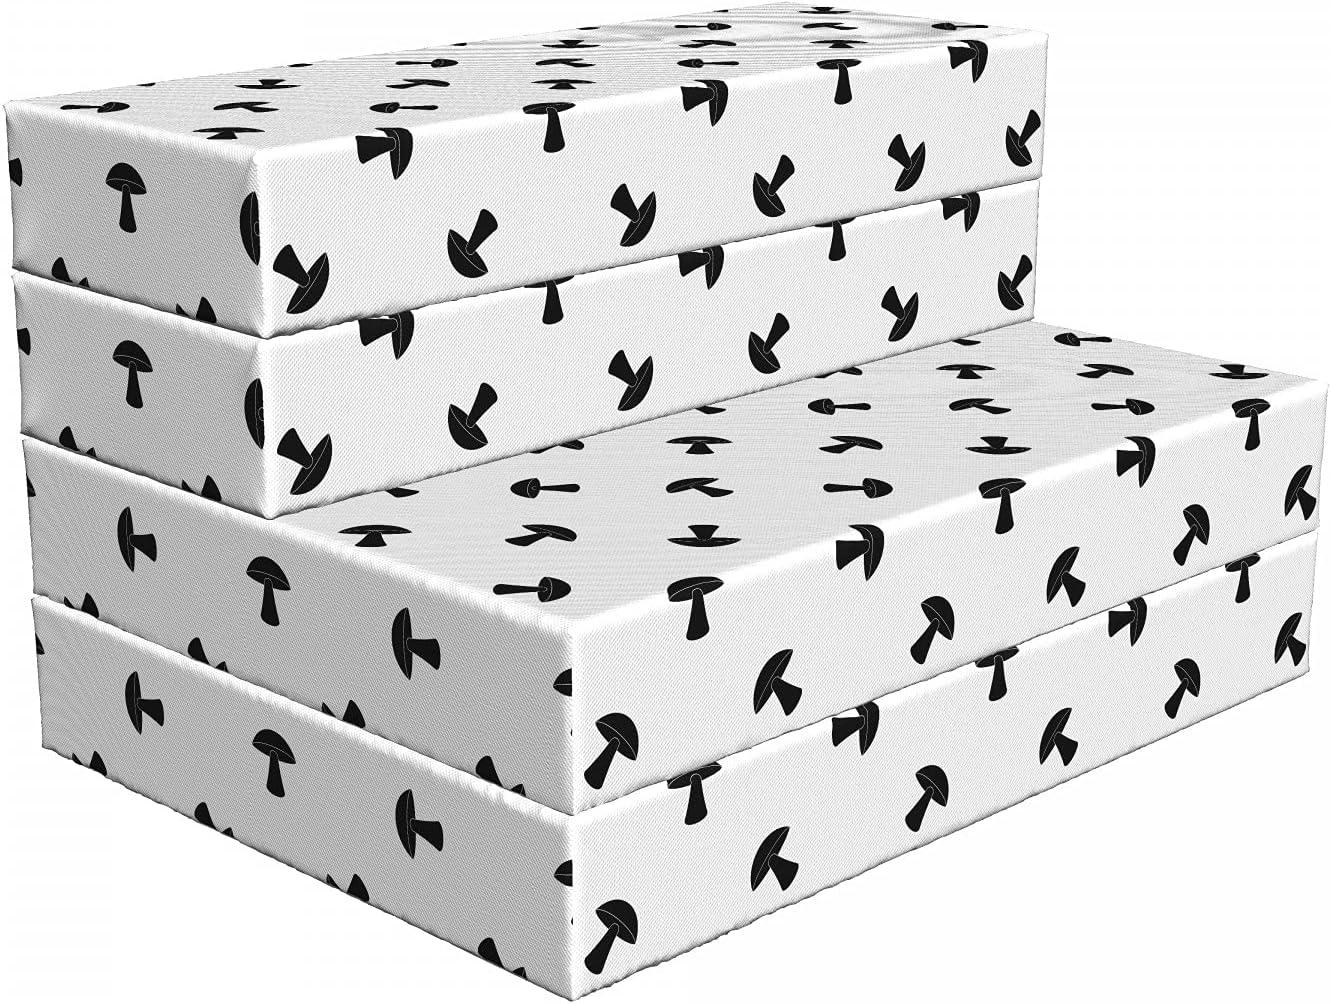 Year-end annual account Ambesonne Mushroom Foldable Mattress Max 59% OFF Black x 74.8